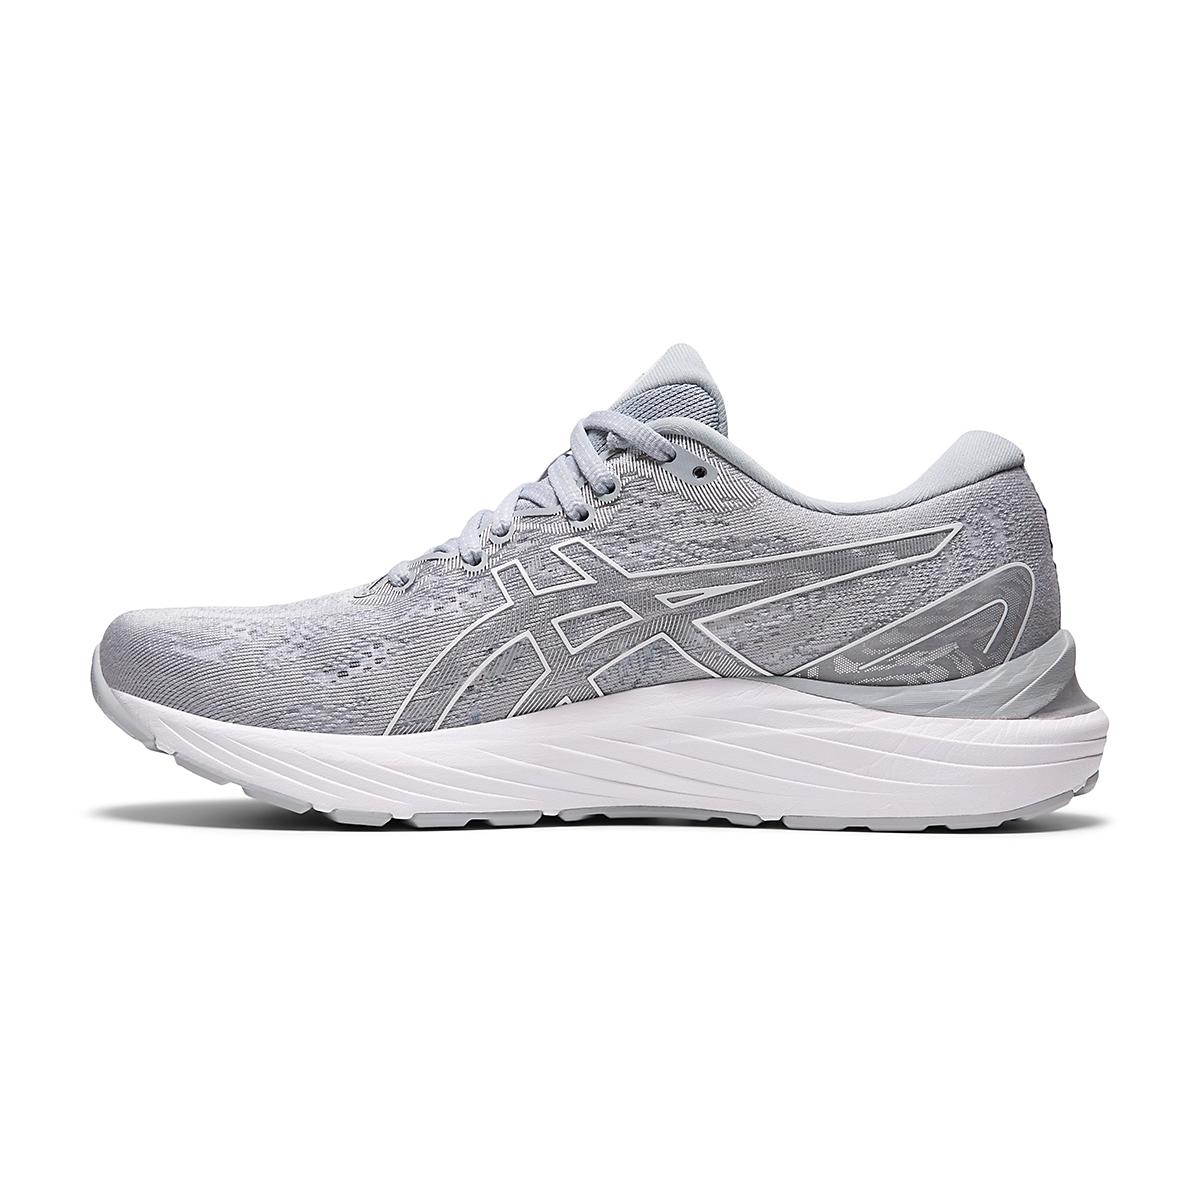 Women's Asics Gel-Cumulus 23 Running Shoe - Color: Piedmont Grey/White - Size: 5 - Width: Regular, Piedmont Grey/White, large, image 2